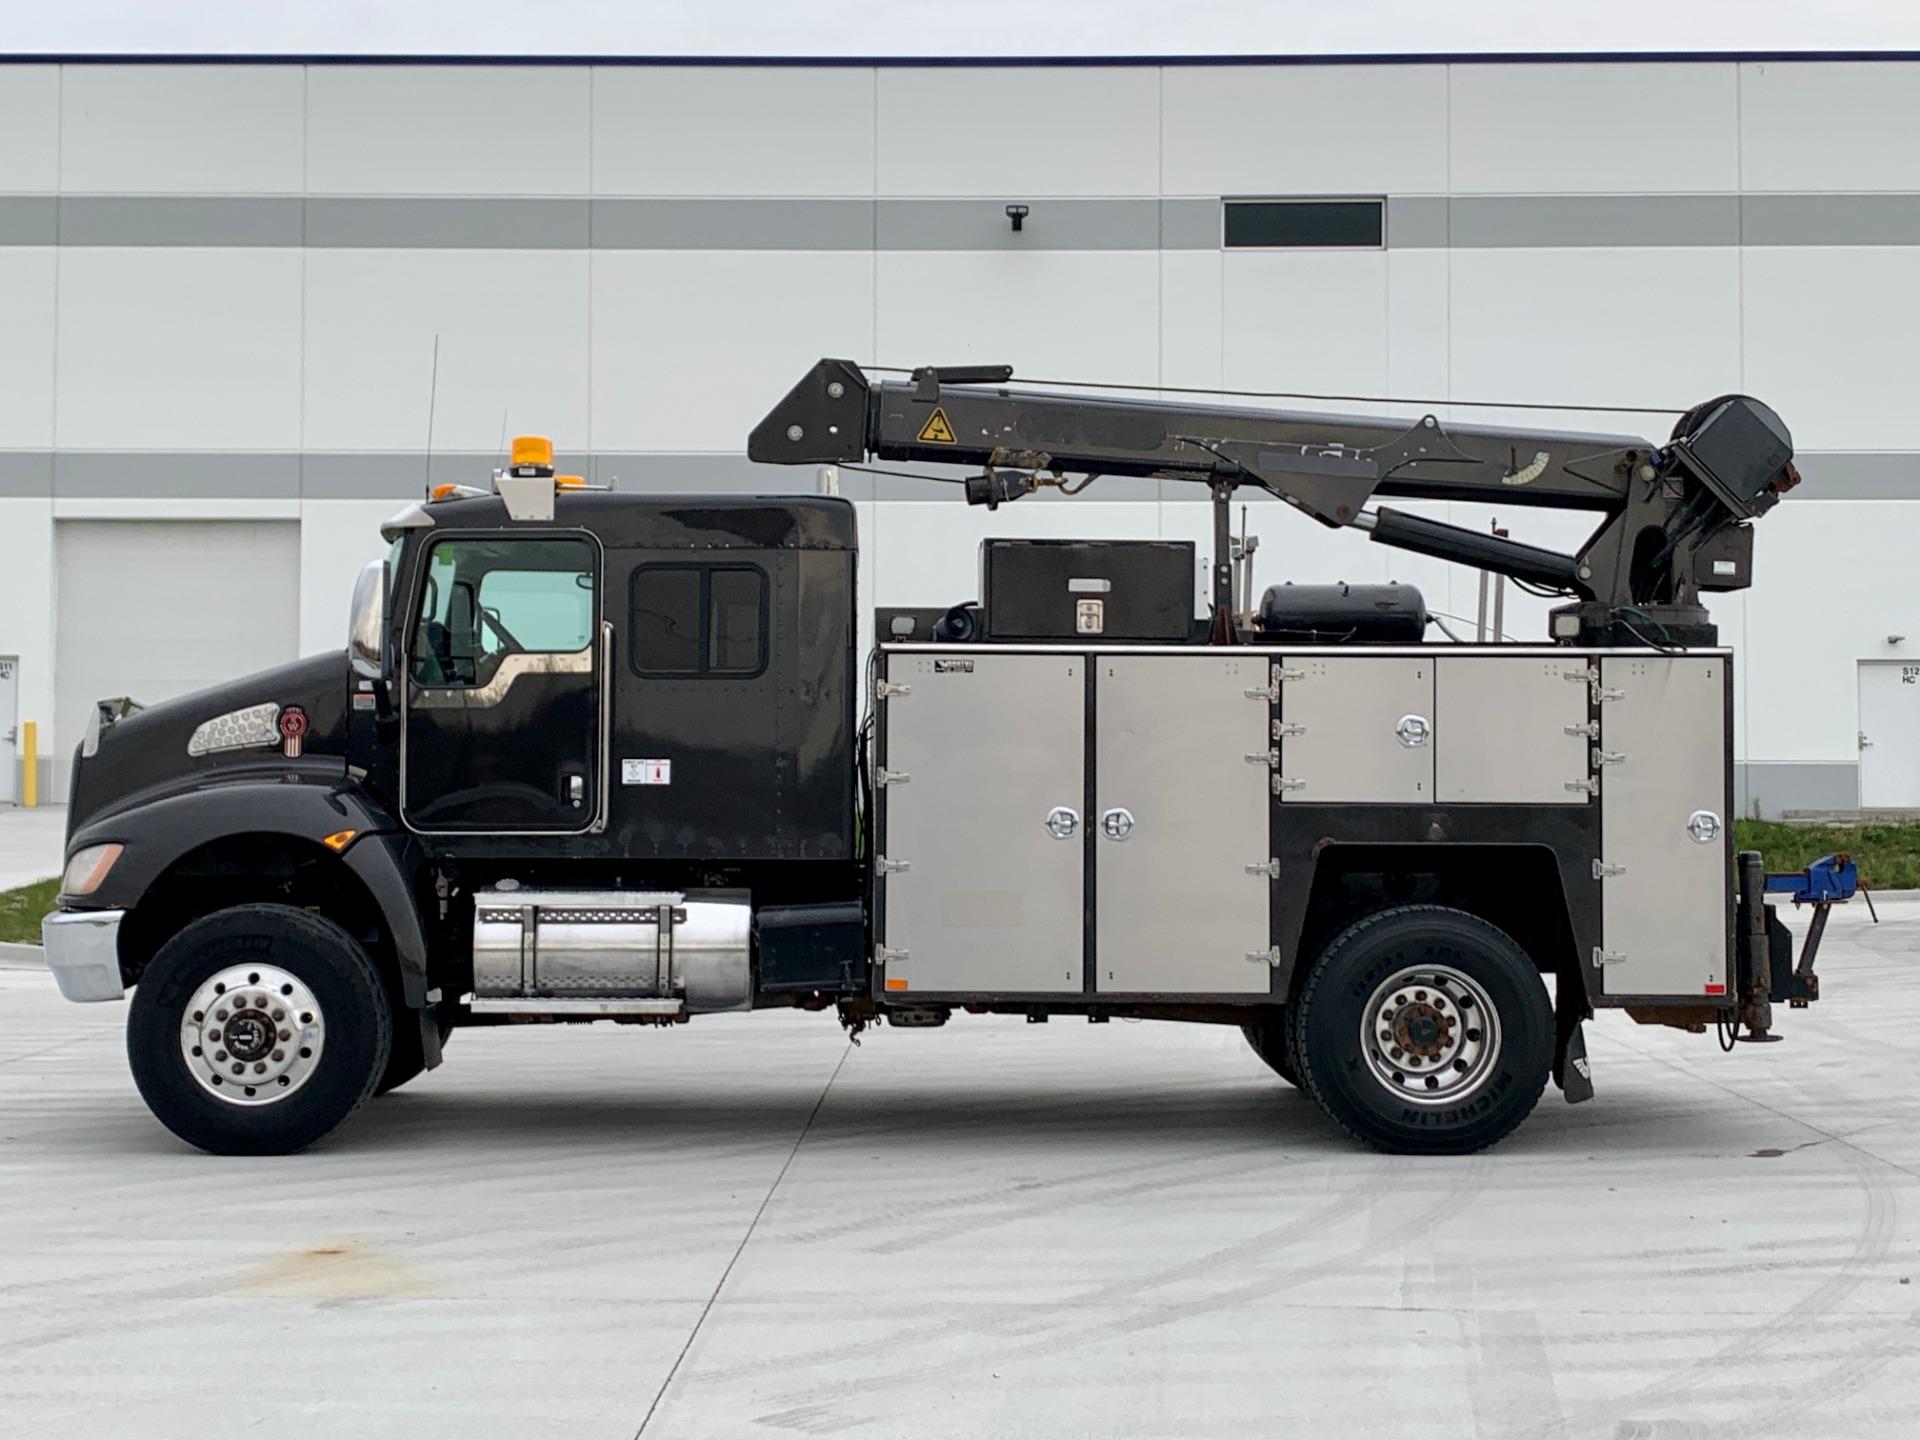 Used-2012-Kenworth-T370-Sleeper-Service-Truck